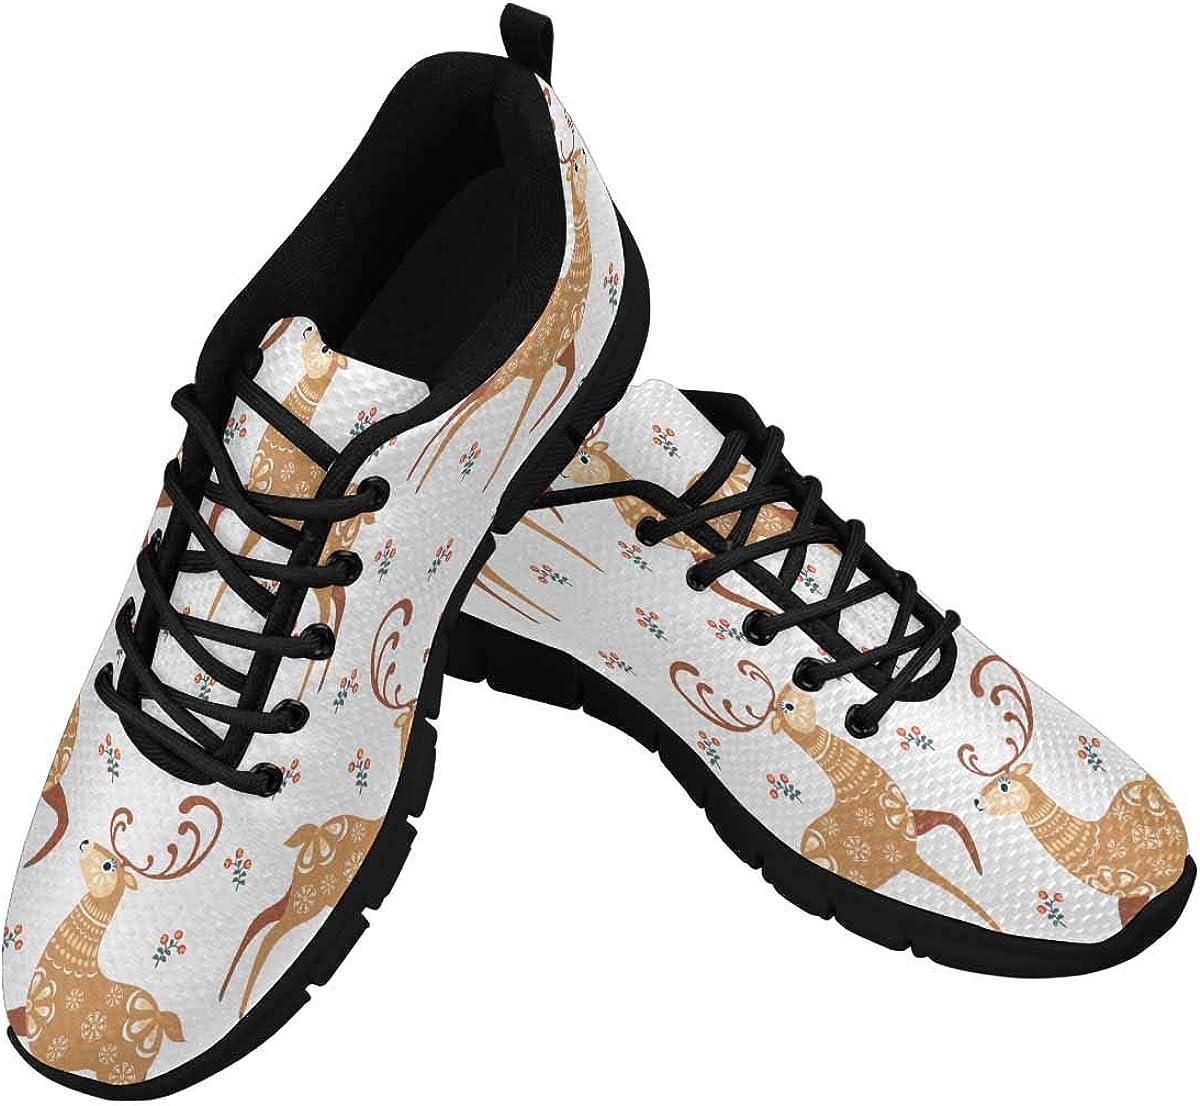 INTERESTPRINT Pattern in Folk Style with Deer Women's Athletic Mesh Breathable Casual Sneaker